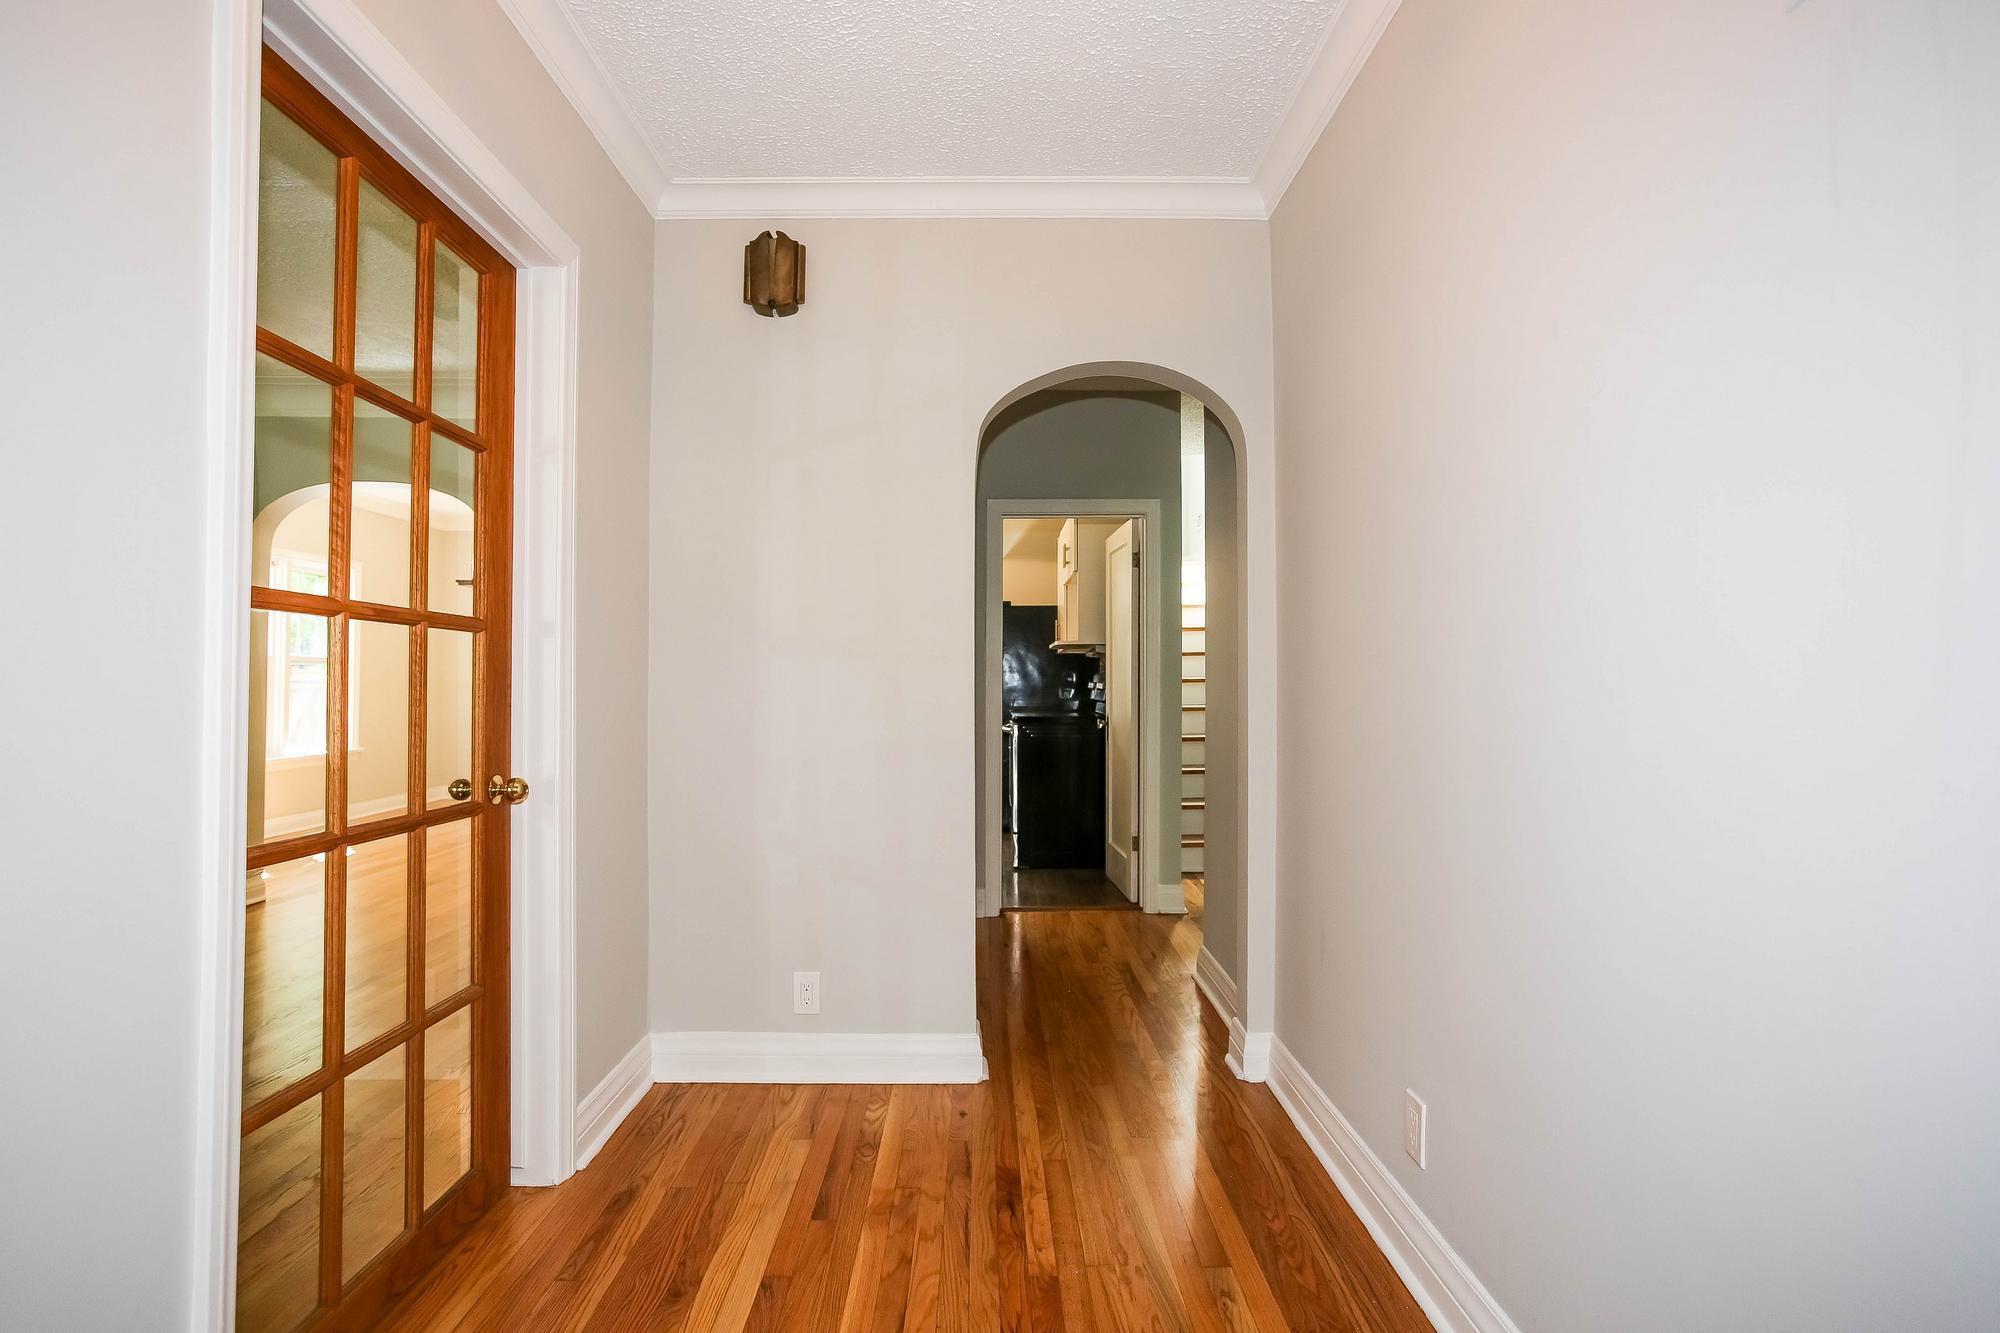 Photo 3: Photos: 155 Borebank Street in Winnipeg: River Heights Single Family Detached for sale (1C)  : MLS®# 202017166